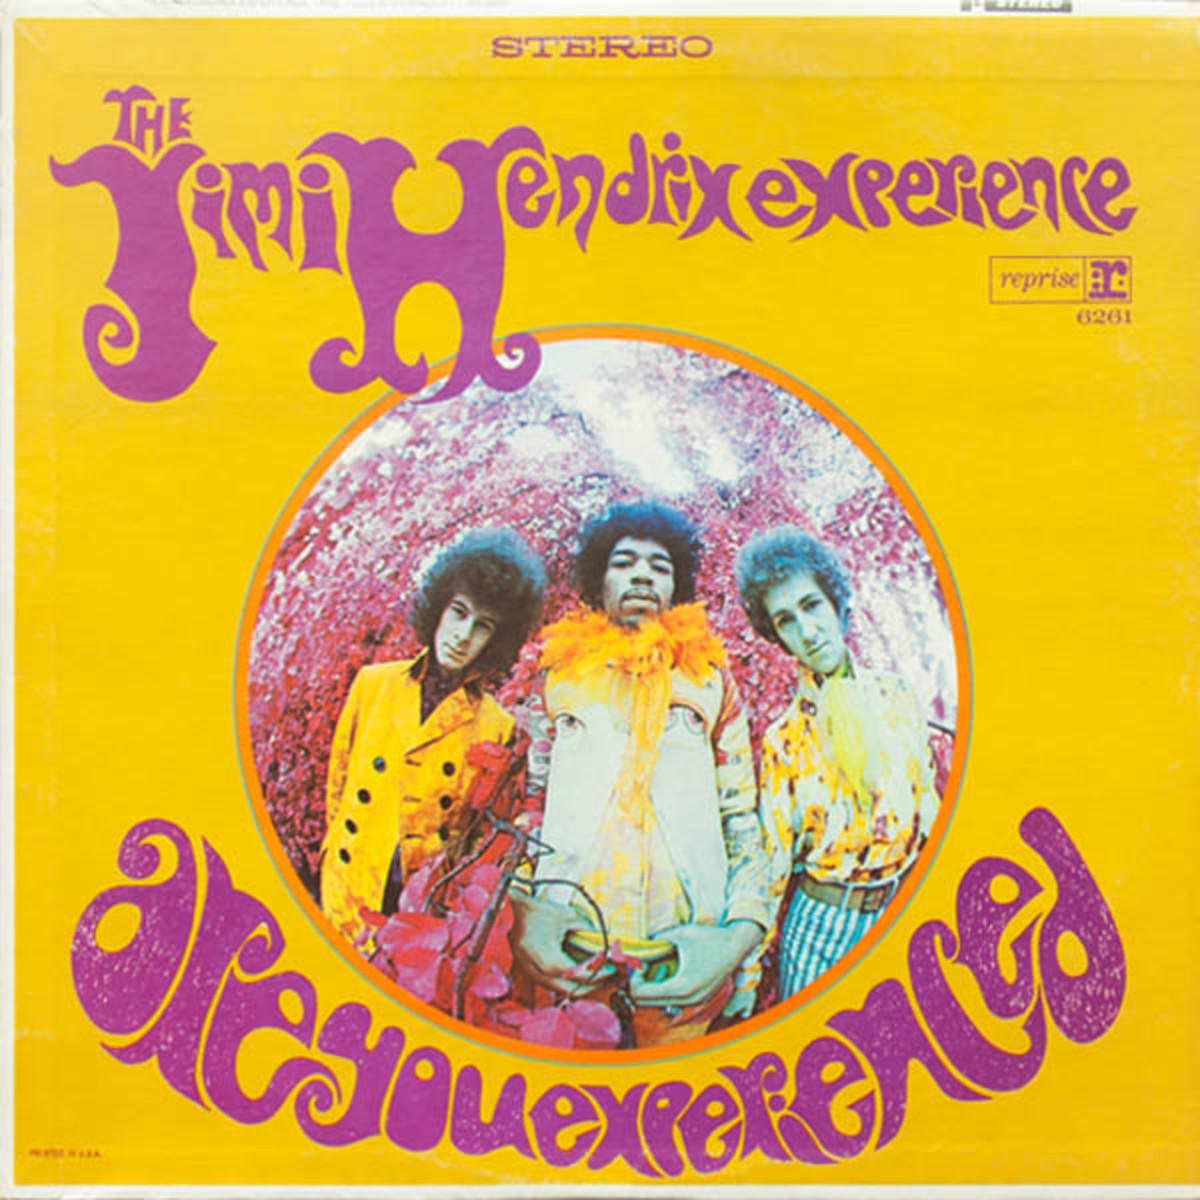 Hendrix-experienced